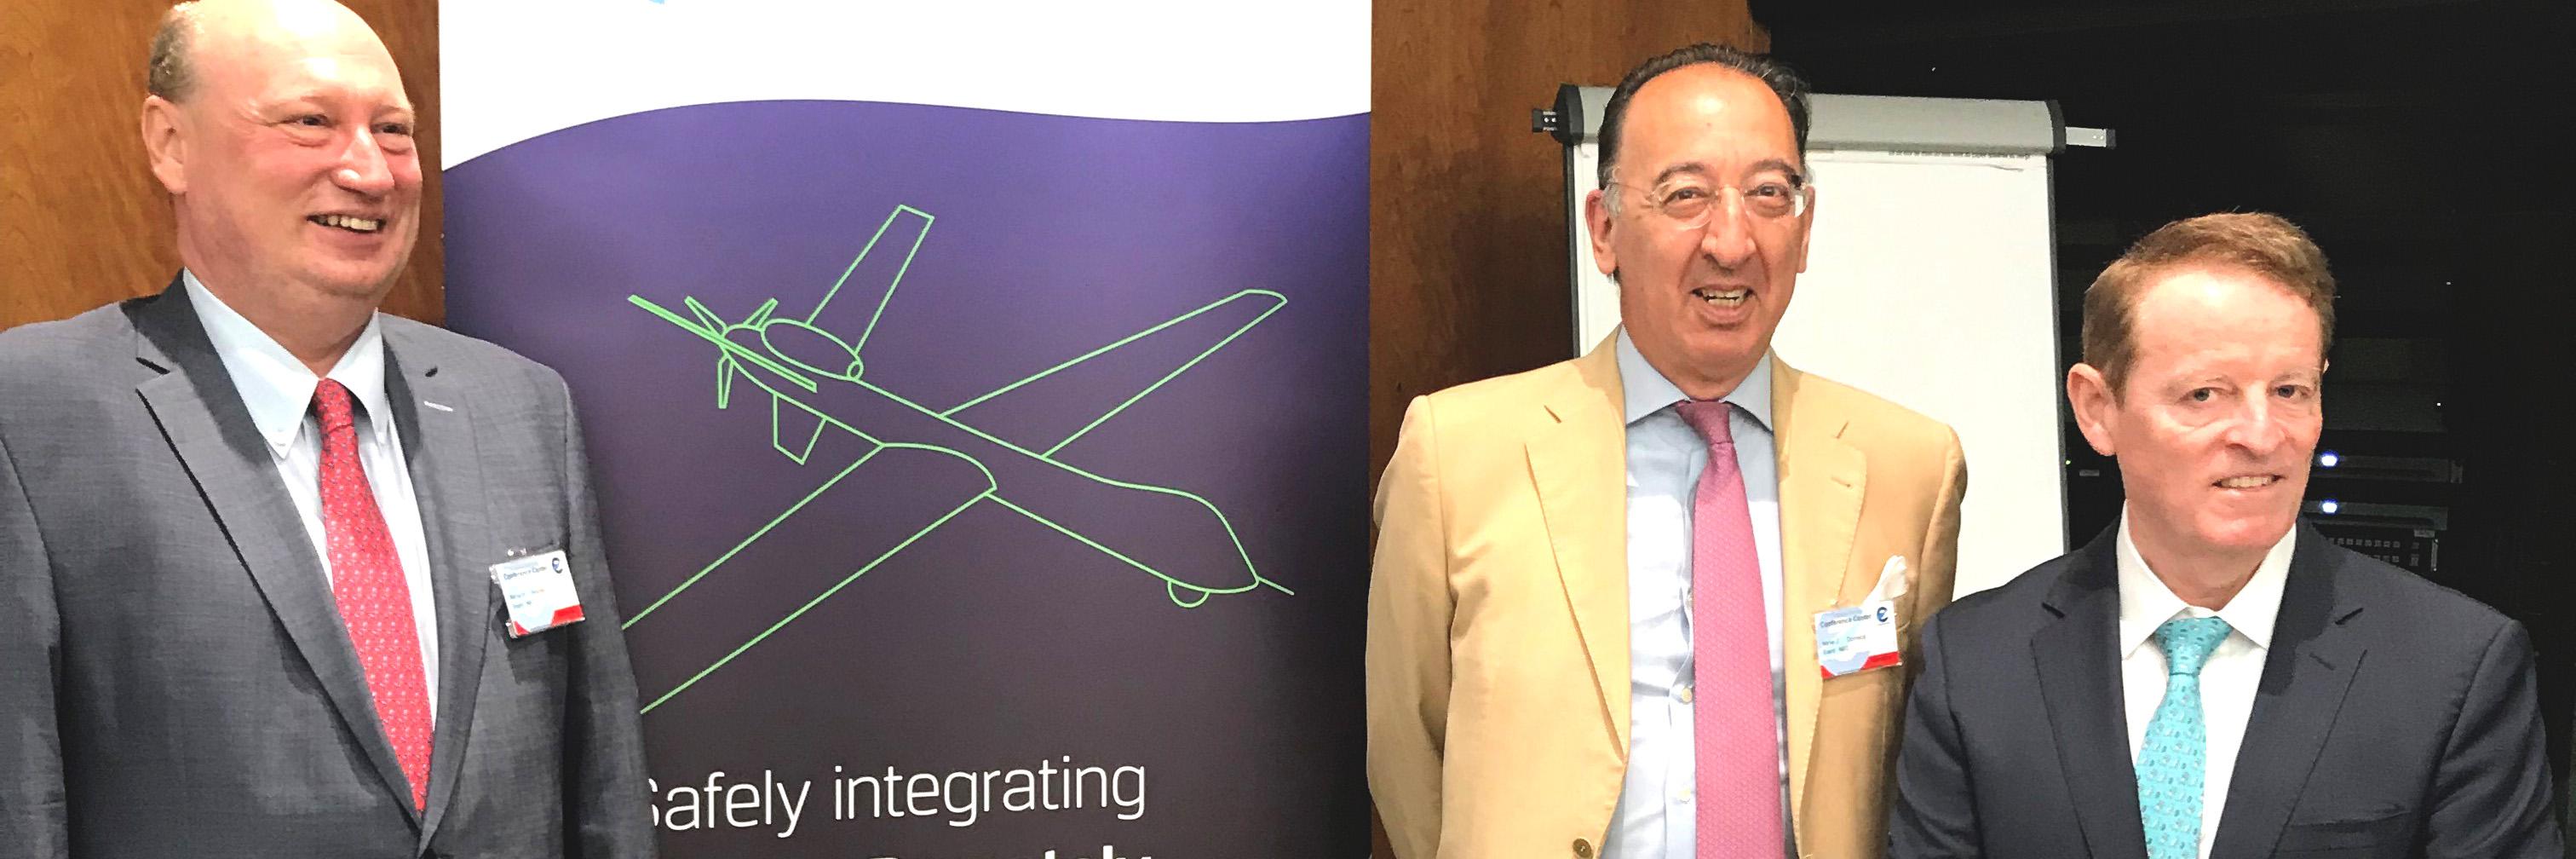 ESMAB meeting focussed on civil & military collaboration in Single European Sky